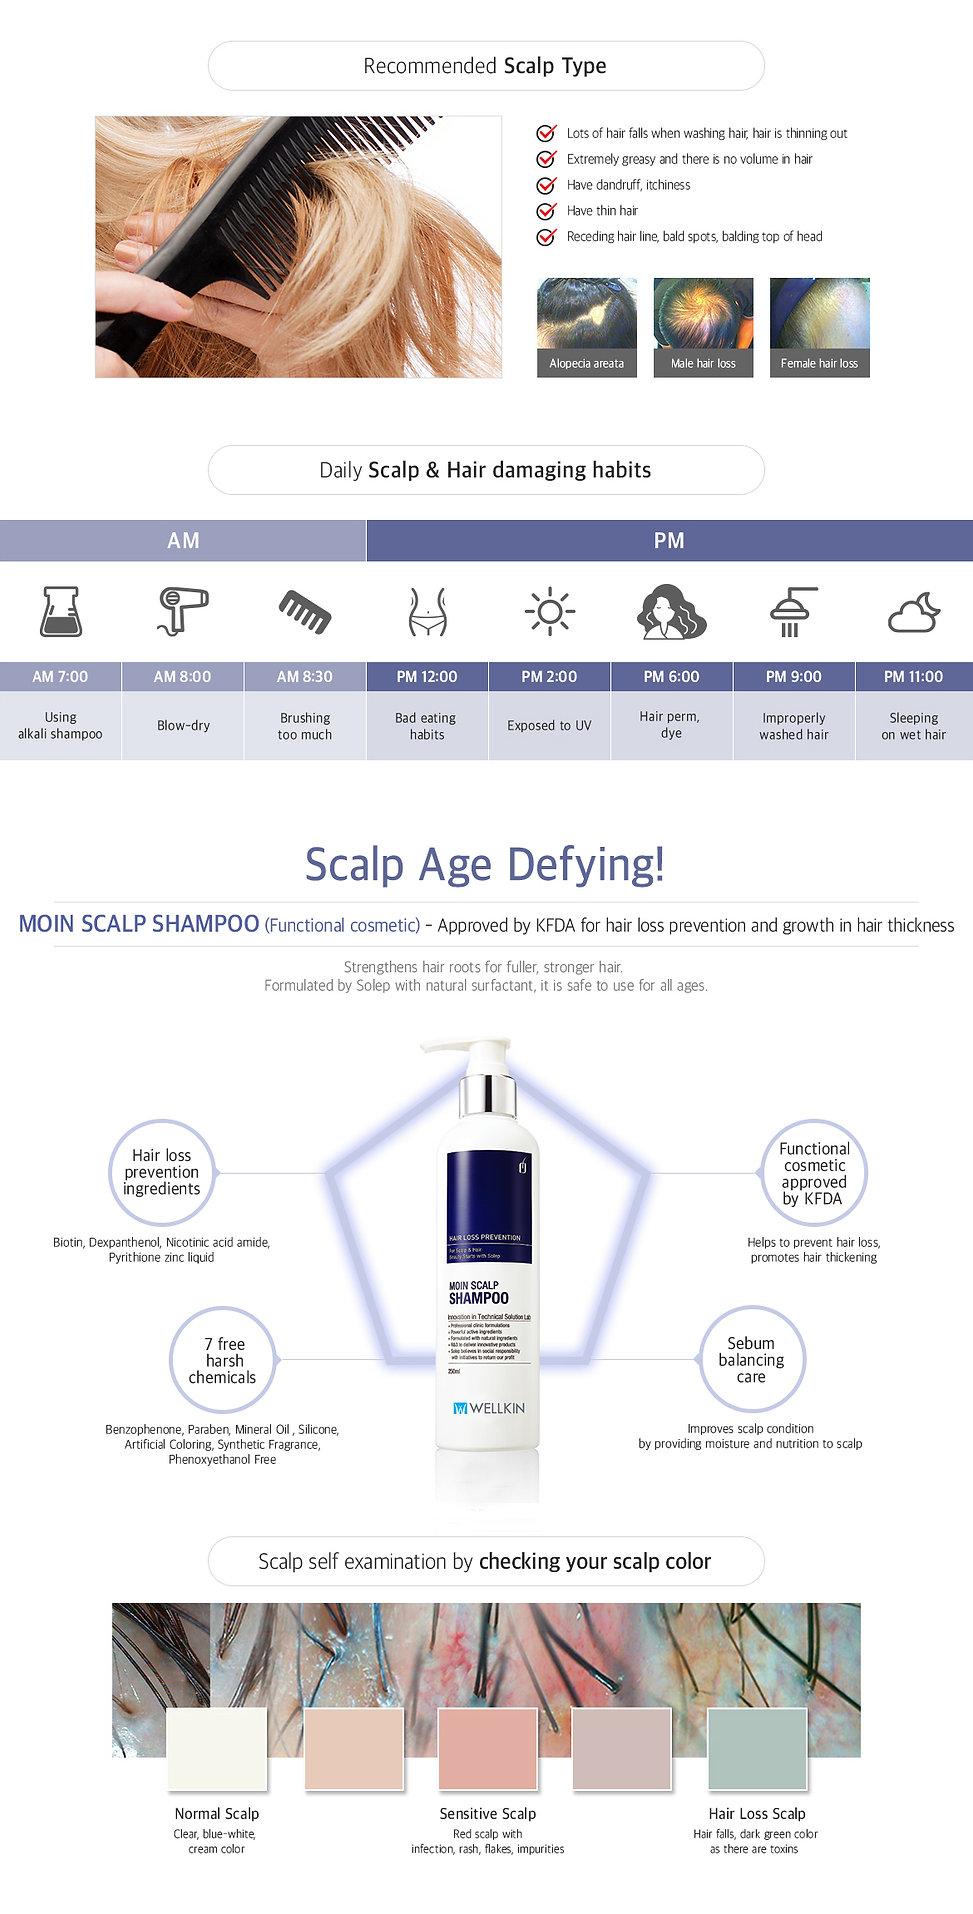 moin_shampoo1 copy.jpg